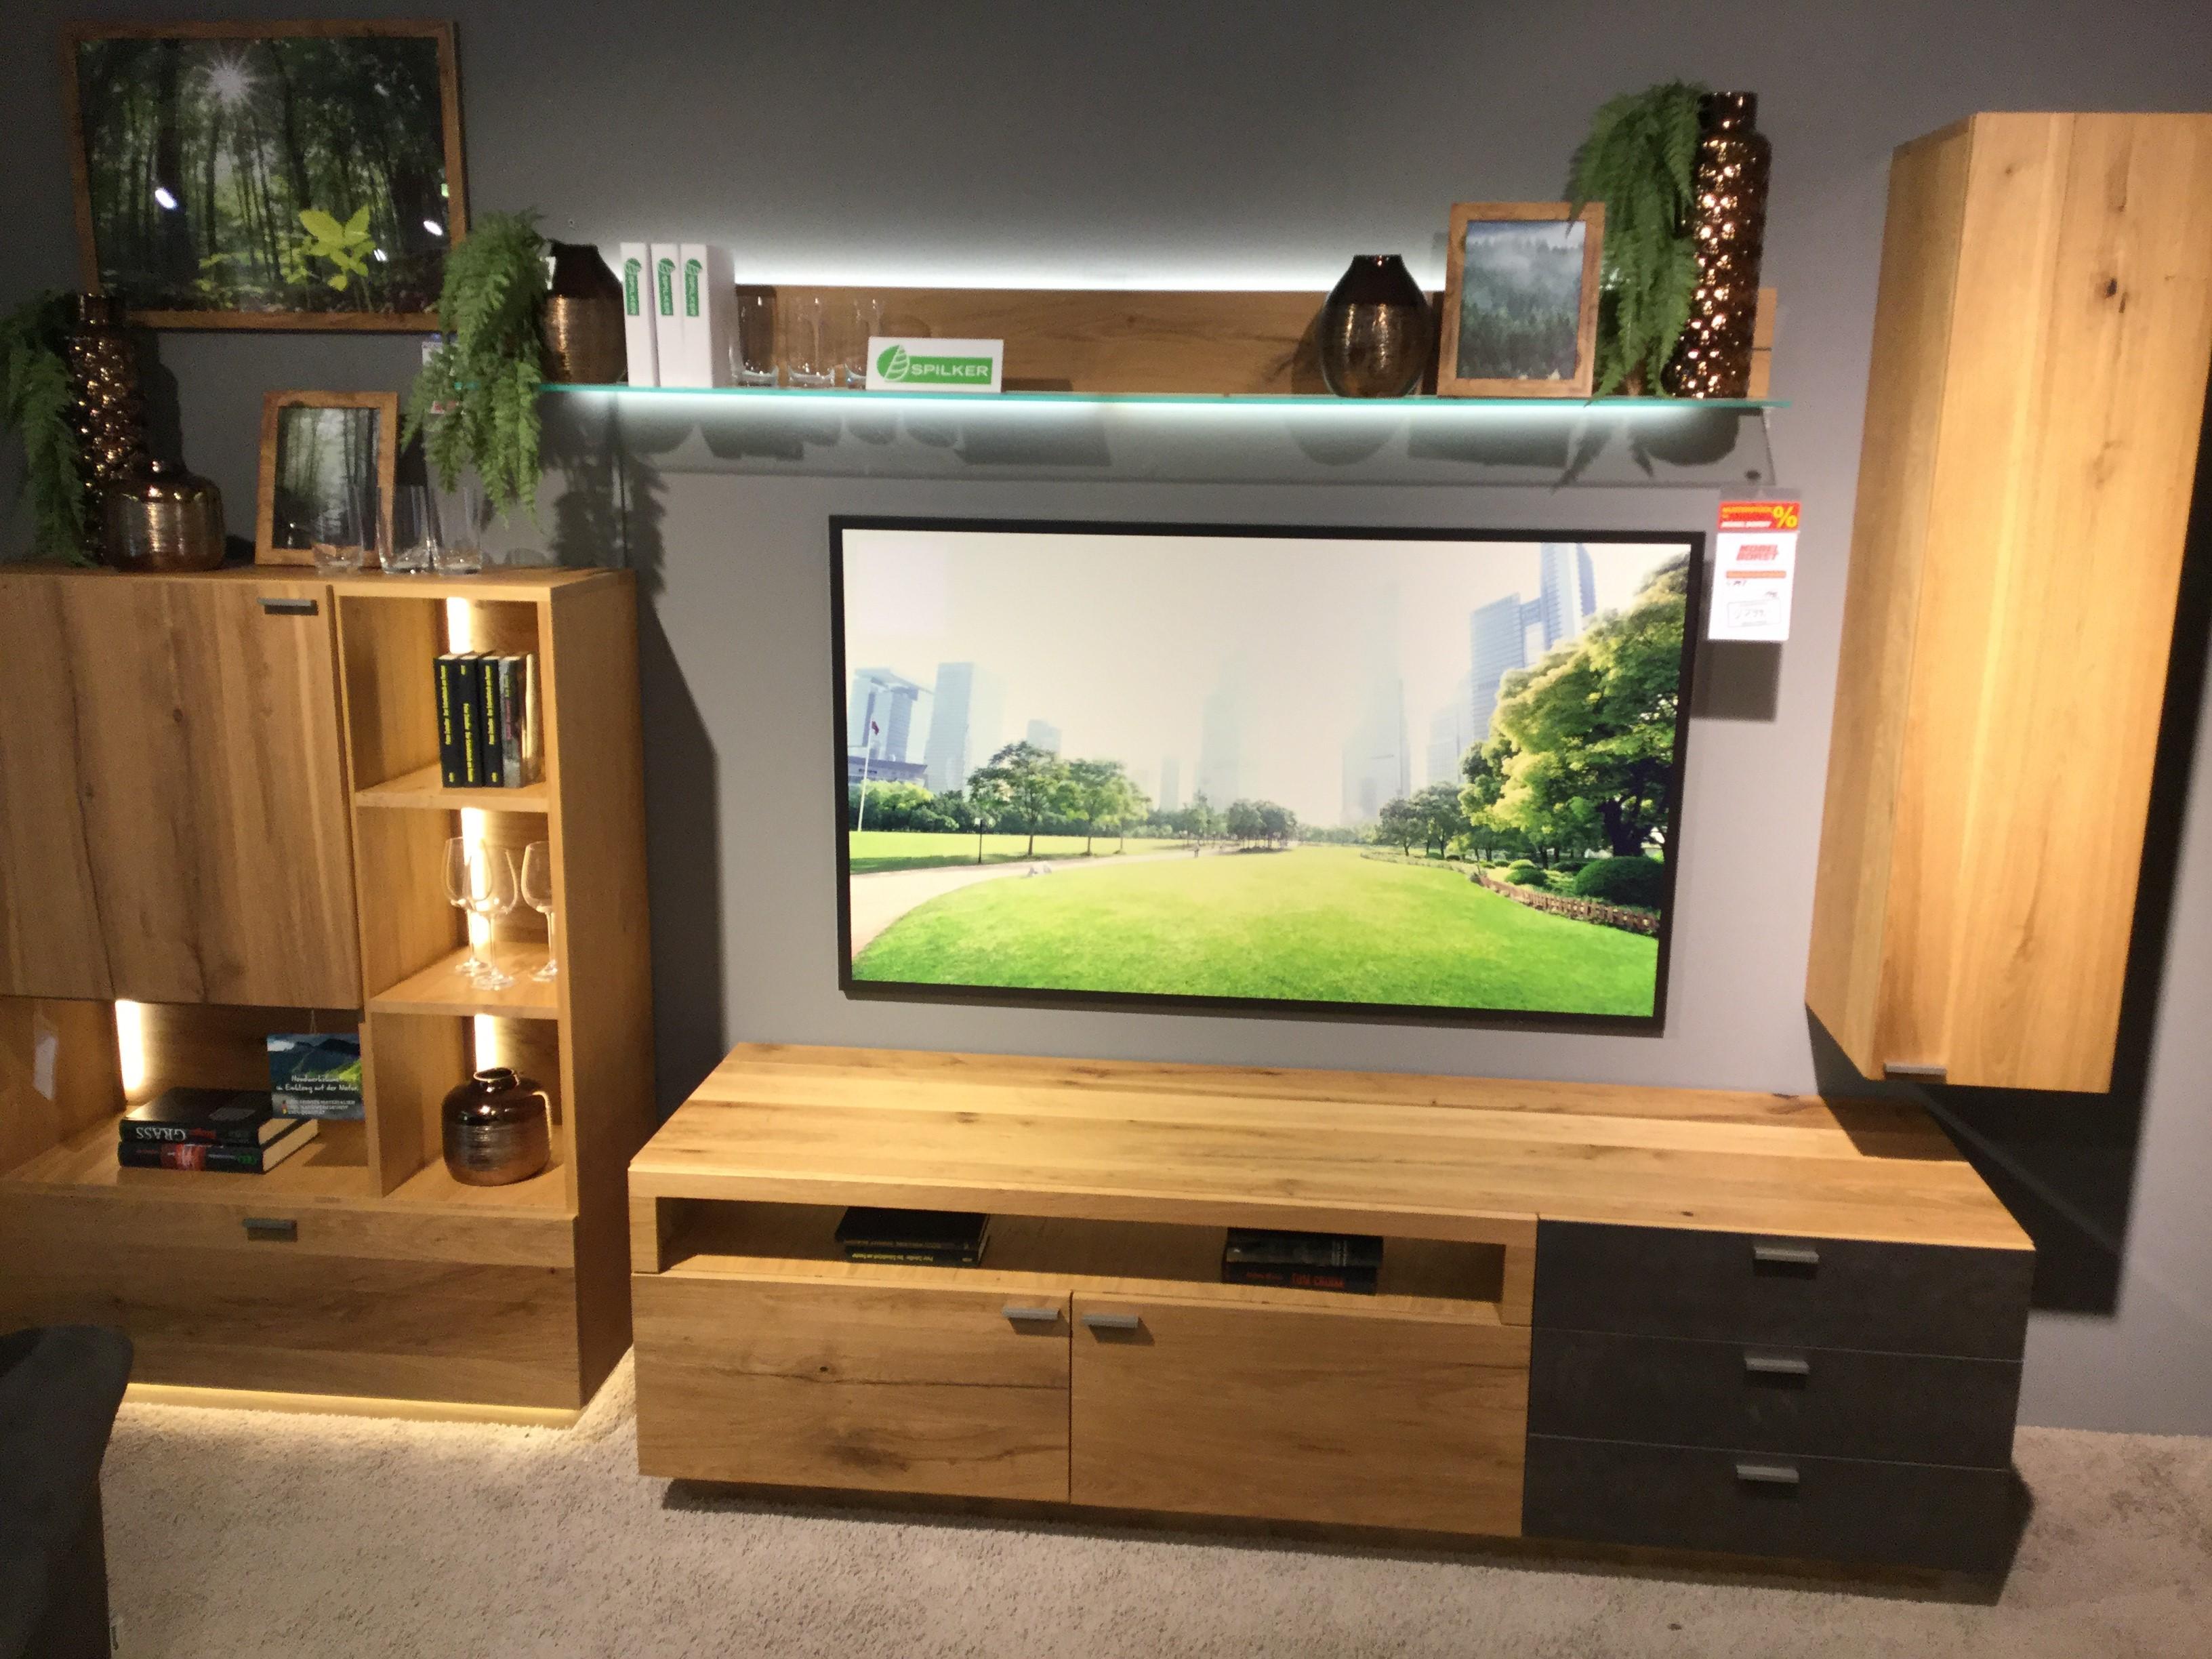 Abverkauf Möbel Borst